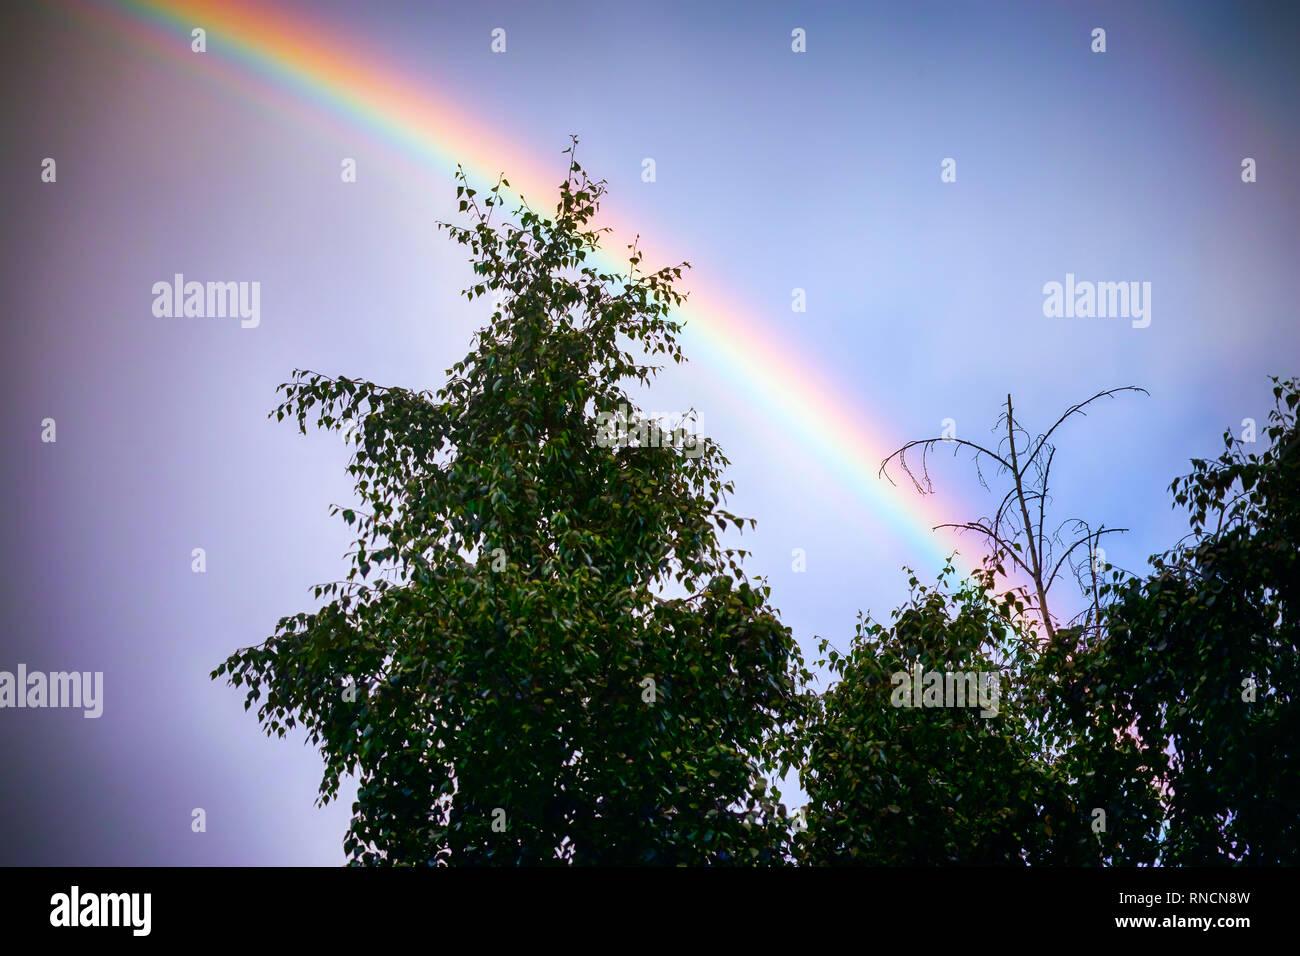 Rainbow over sky. Natural phenomenon. - Stock Image